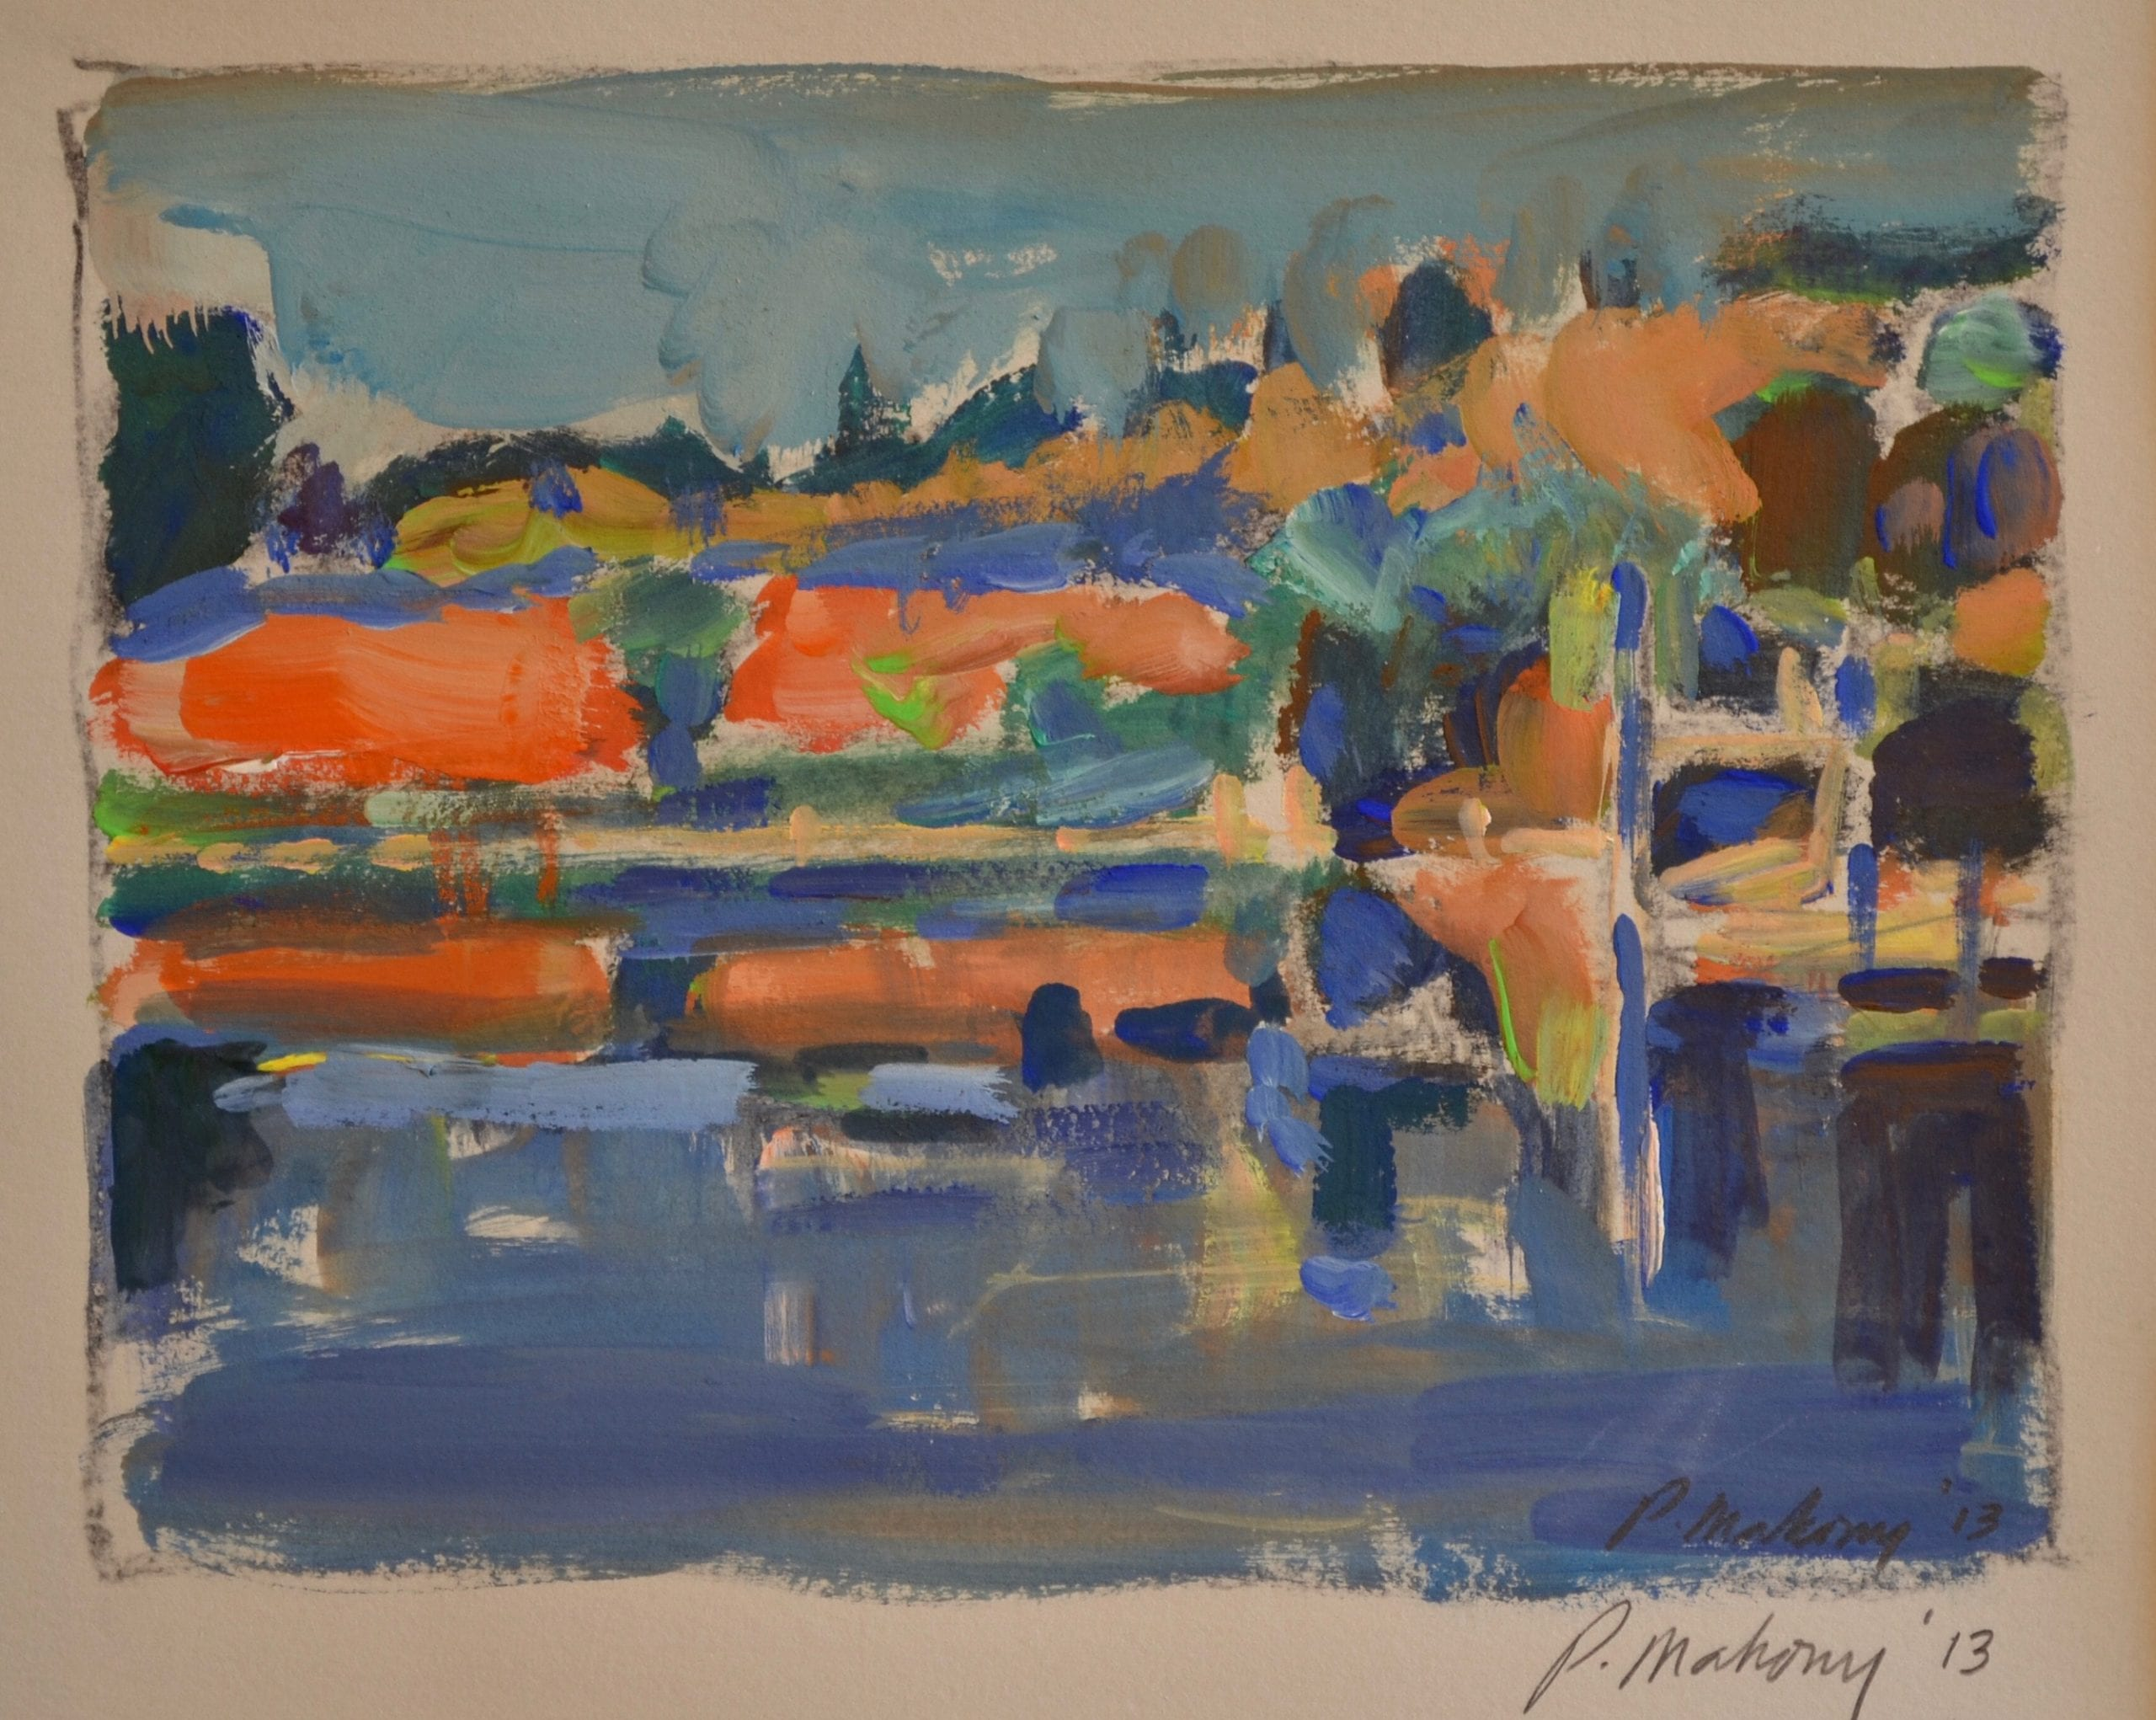 "Pat Mahony - William Pond (Study) - 2020 - Gouache on Paper - 7"" x 9"""